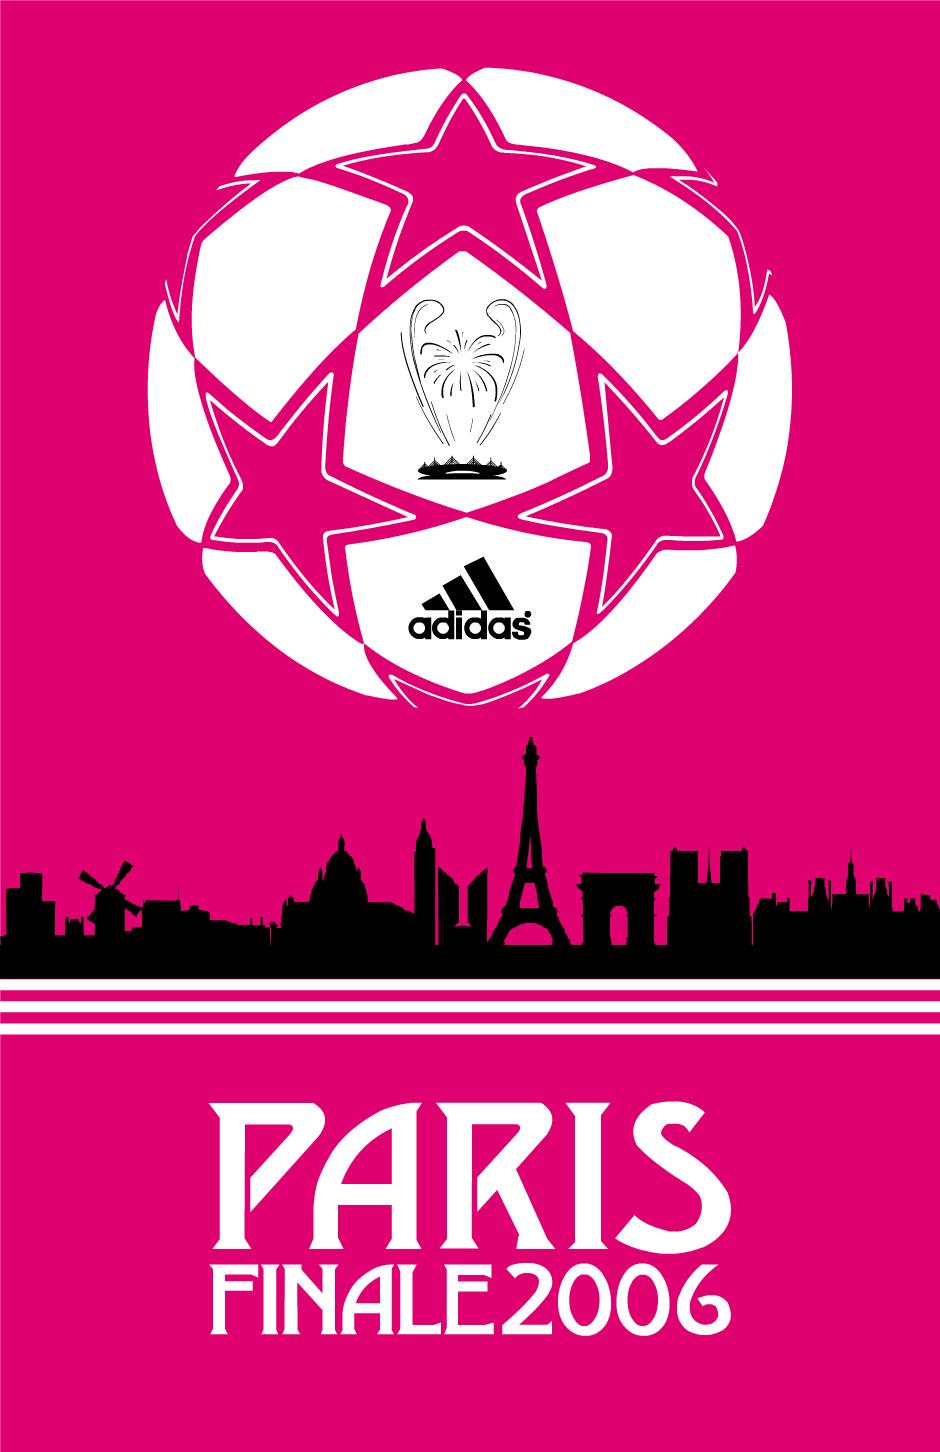 UEFA CHAMPIONS LEAGUE POSTERS BY STEVE WELSH X ADIDAS IBWM